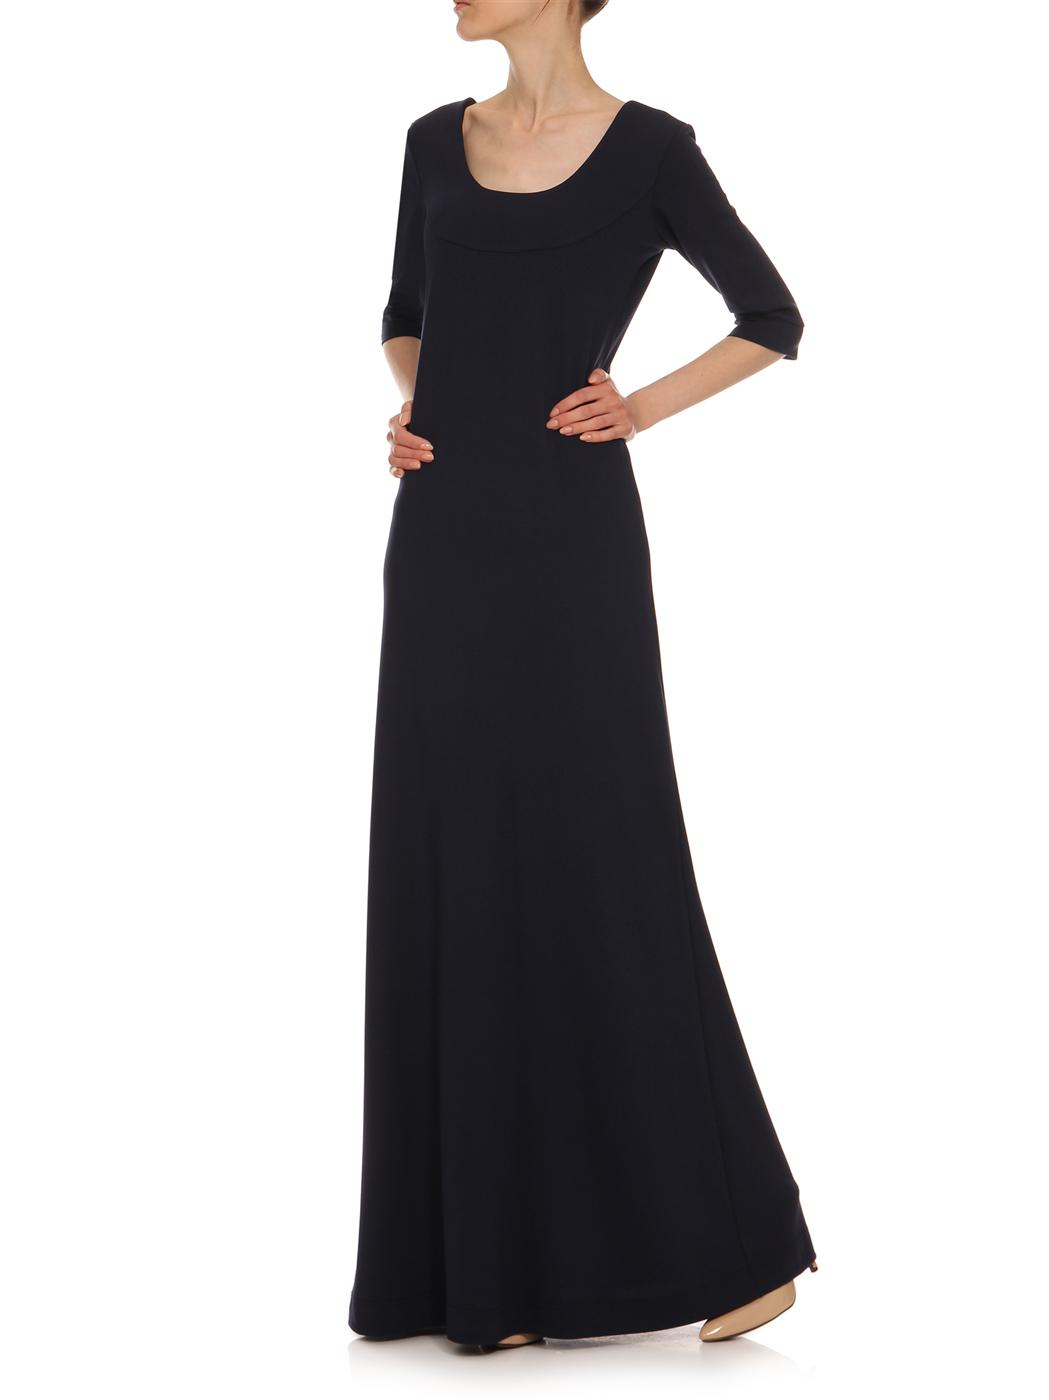 626005ddf2e Marineblaues Kleid YY300105